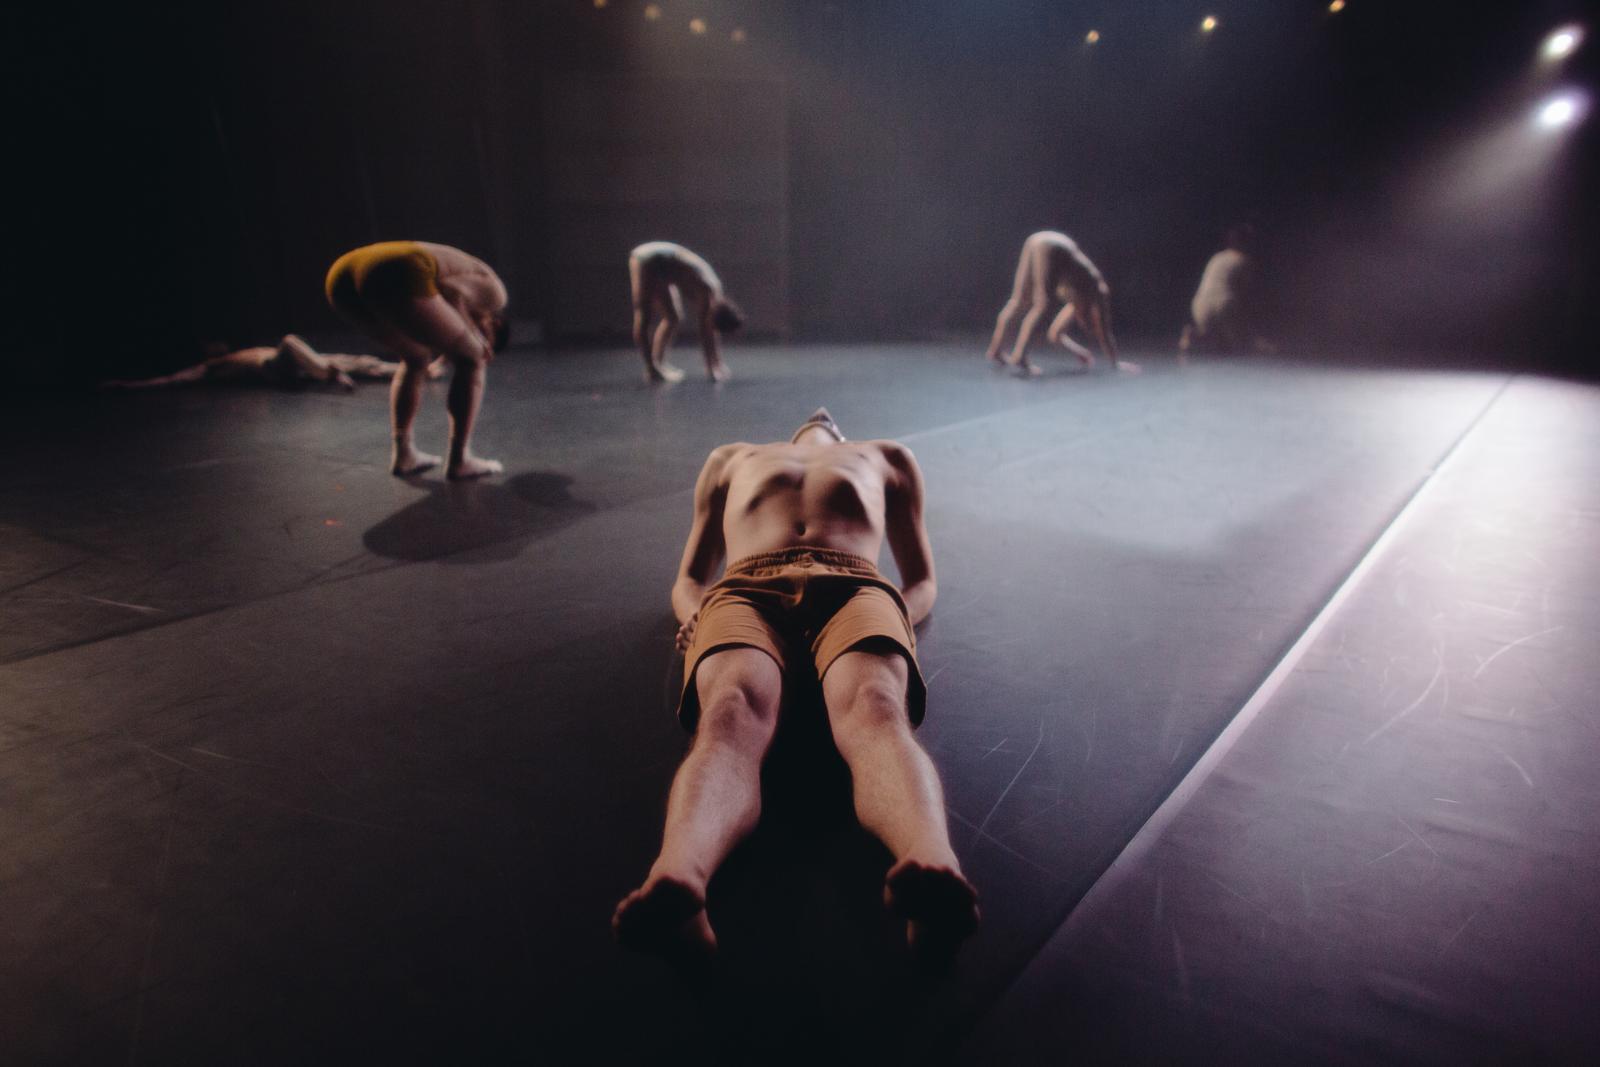 Dēmos by Liz Roche Company & Crash Ensemble © Steve O'Connor